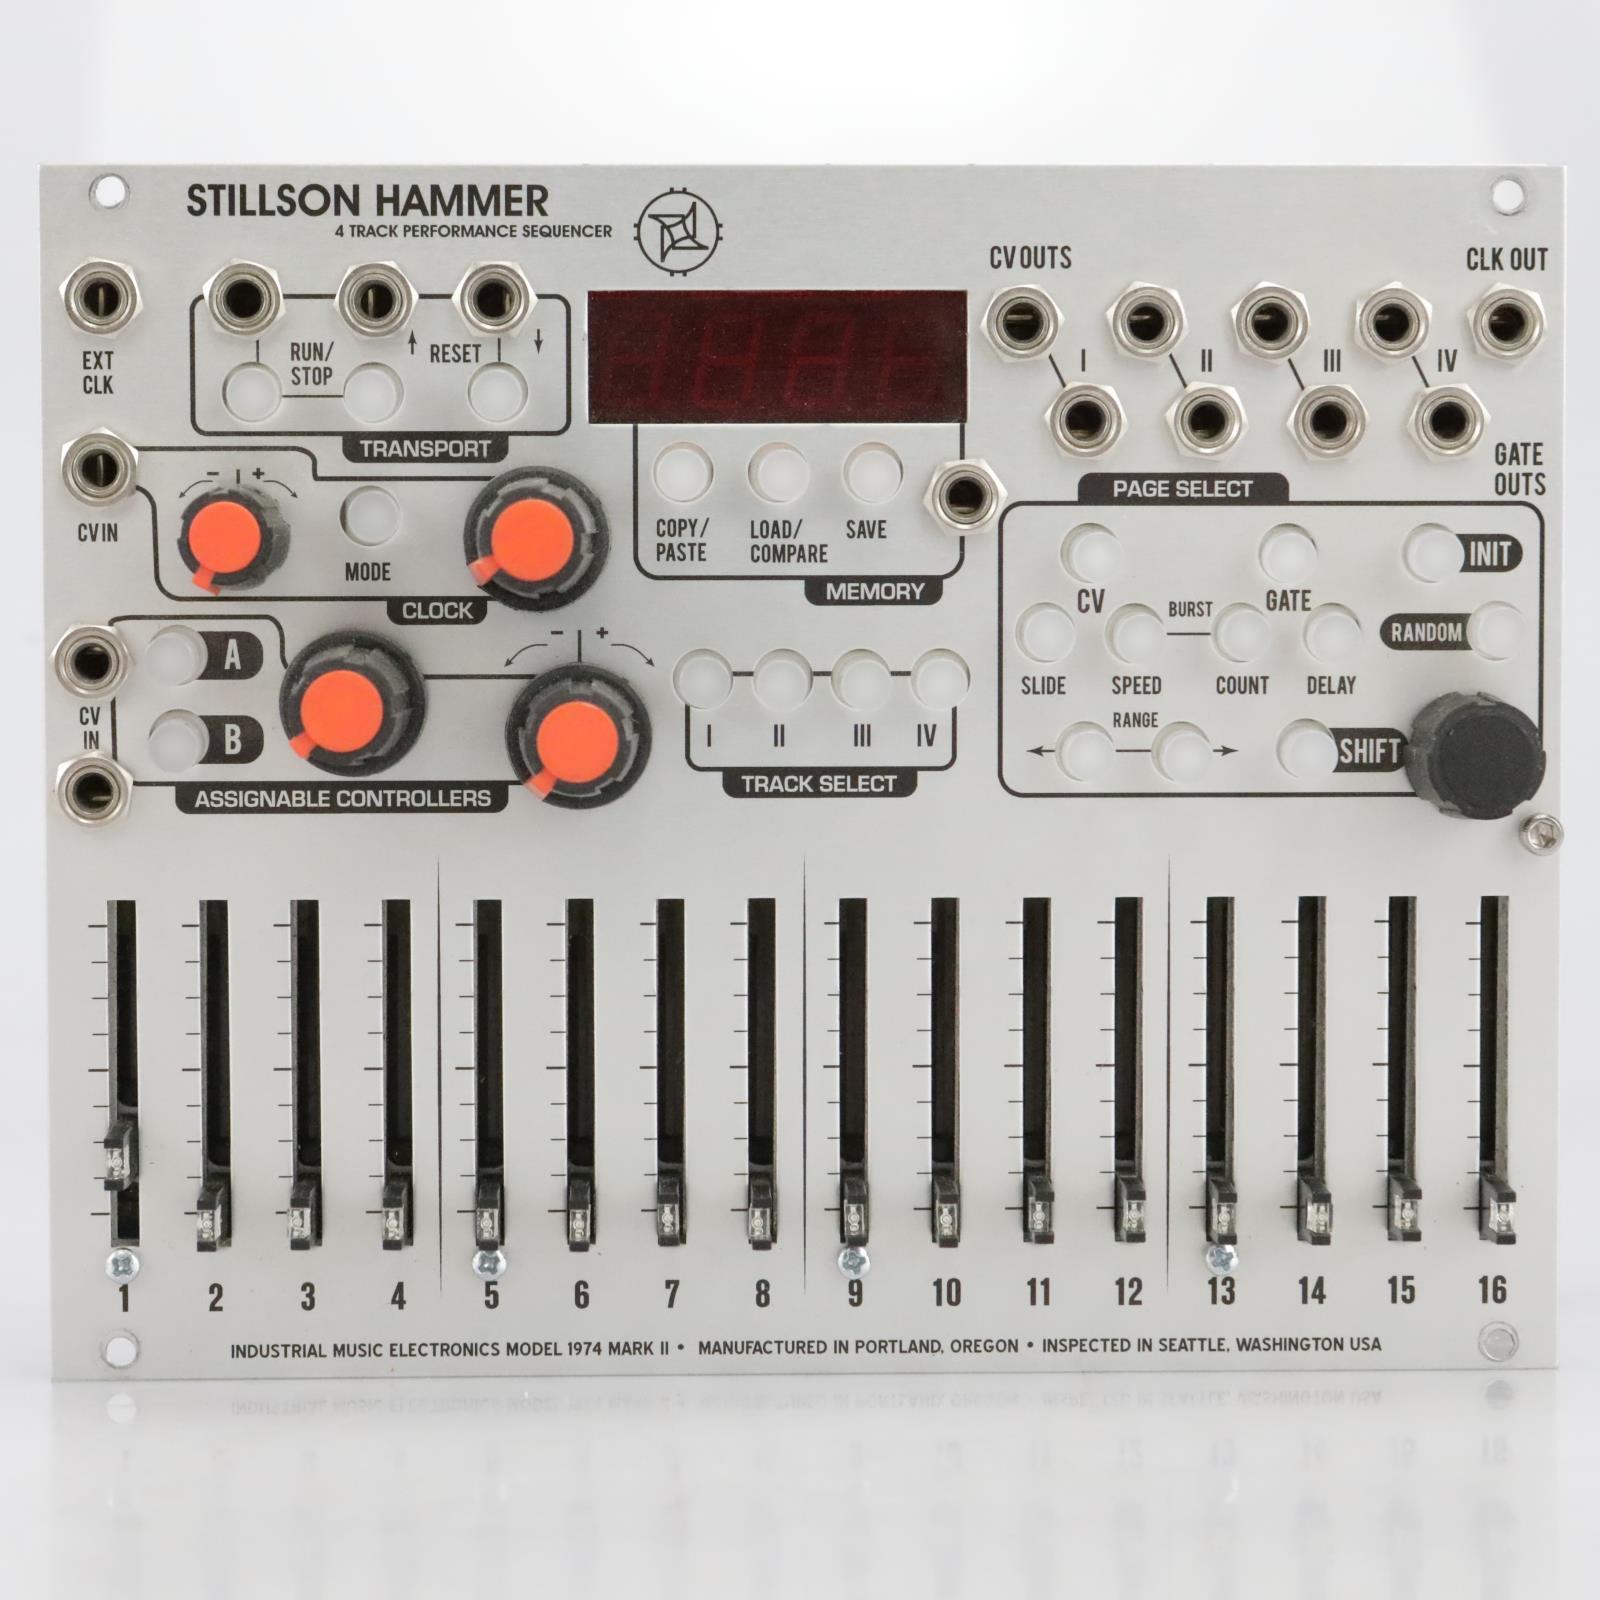 Industrial Music Electronics 1974 Mk II Stillson Hammer Eurorack Module #40941